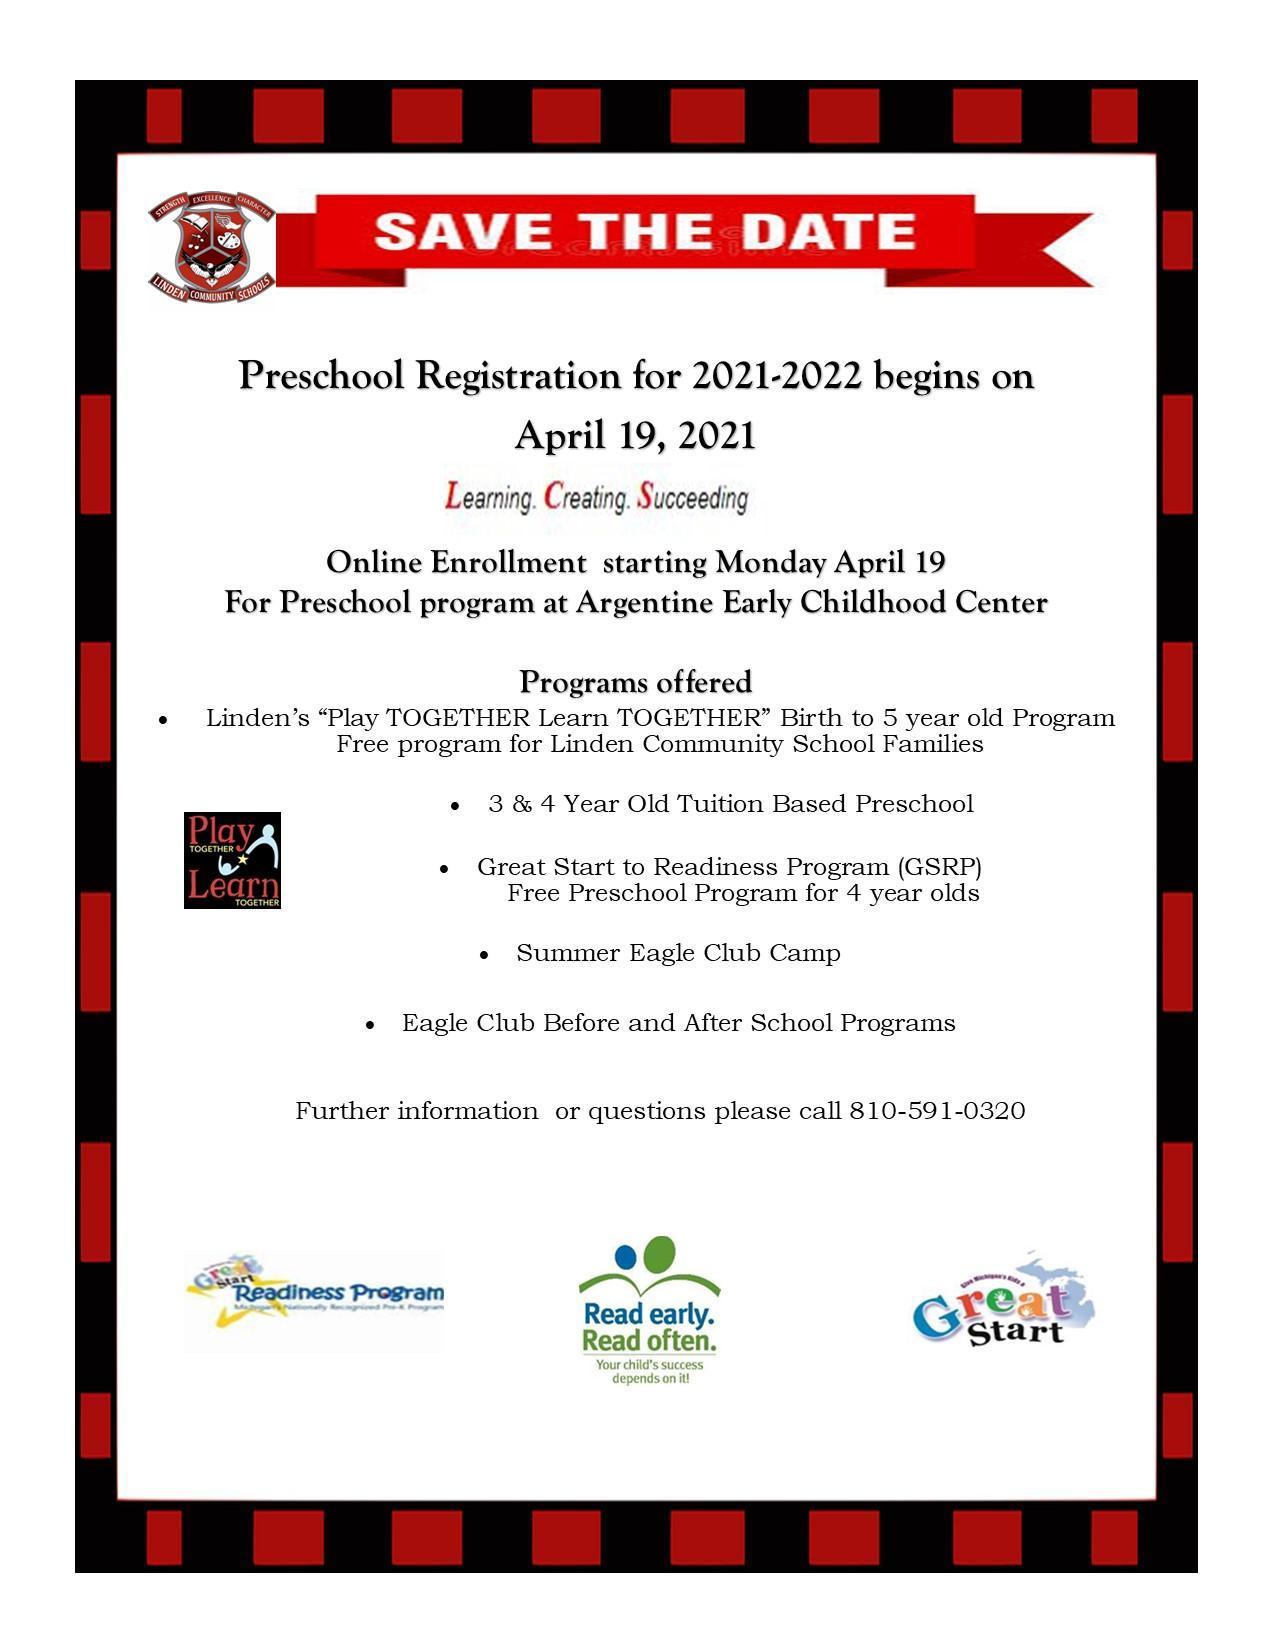 Preschool Registration Save the Date